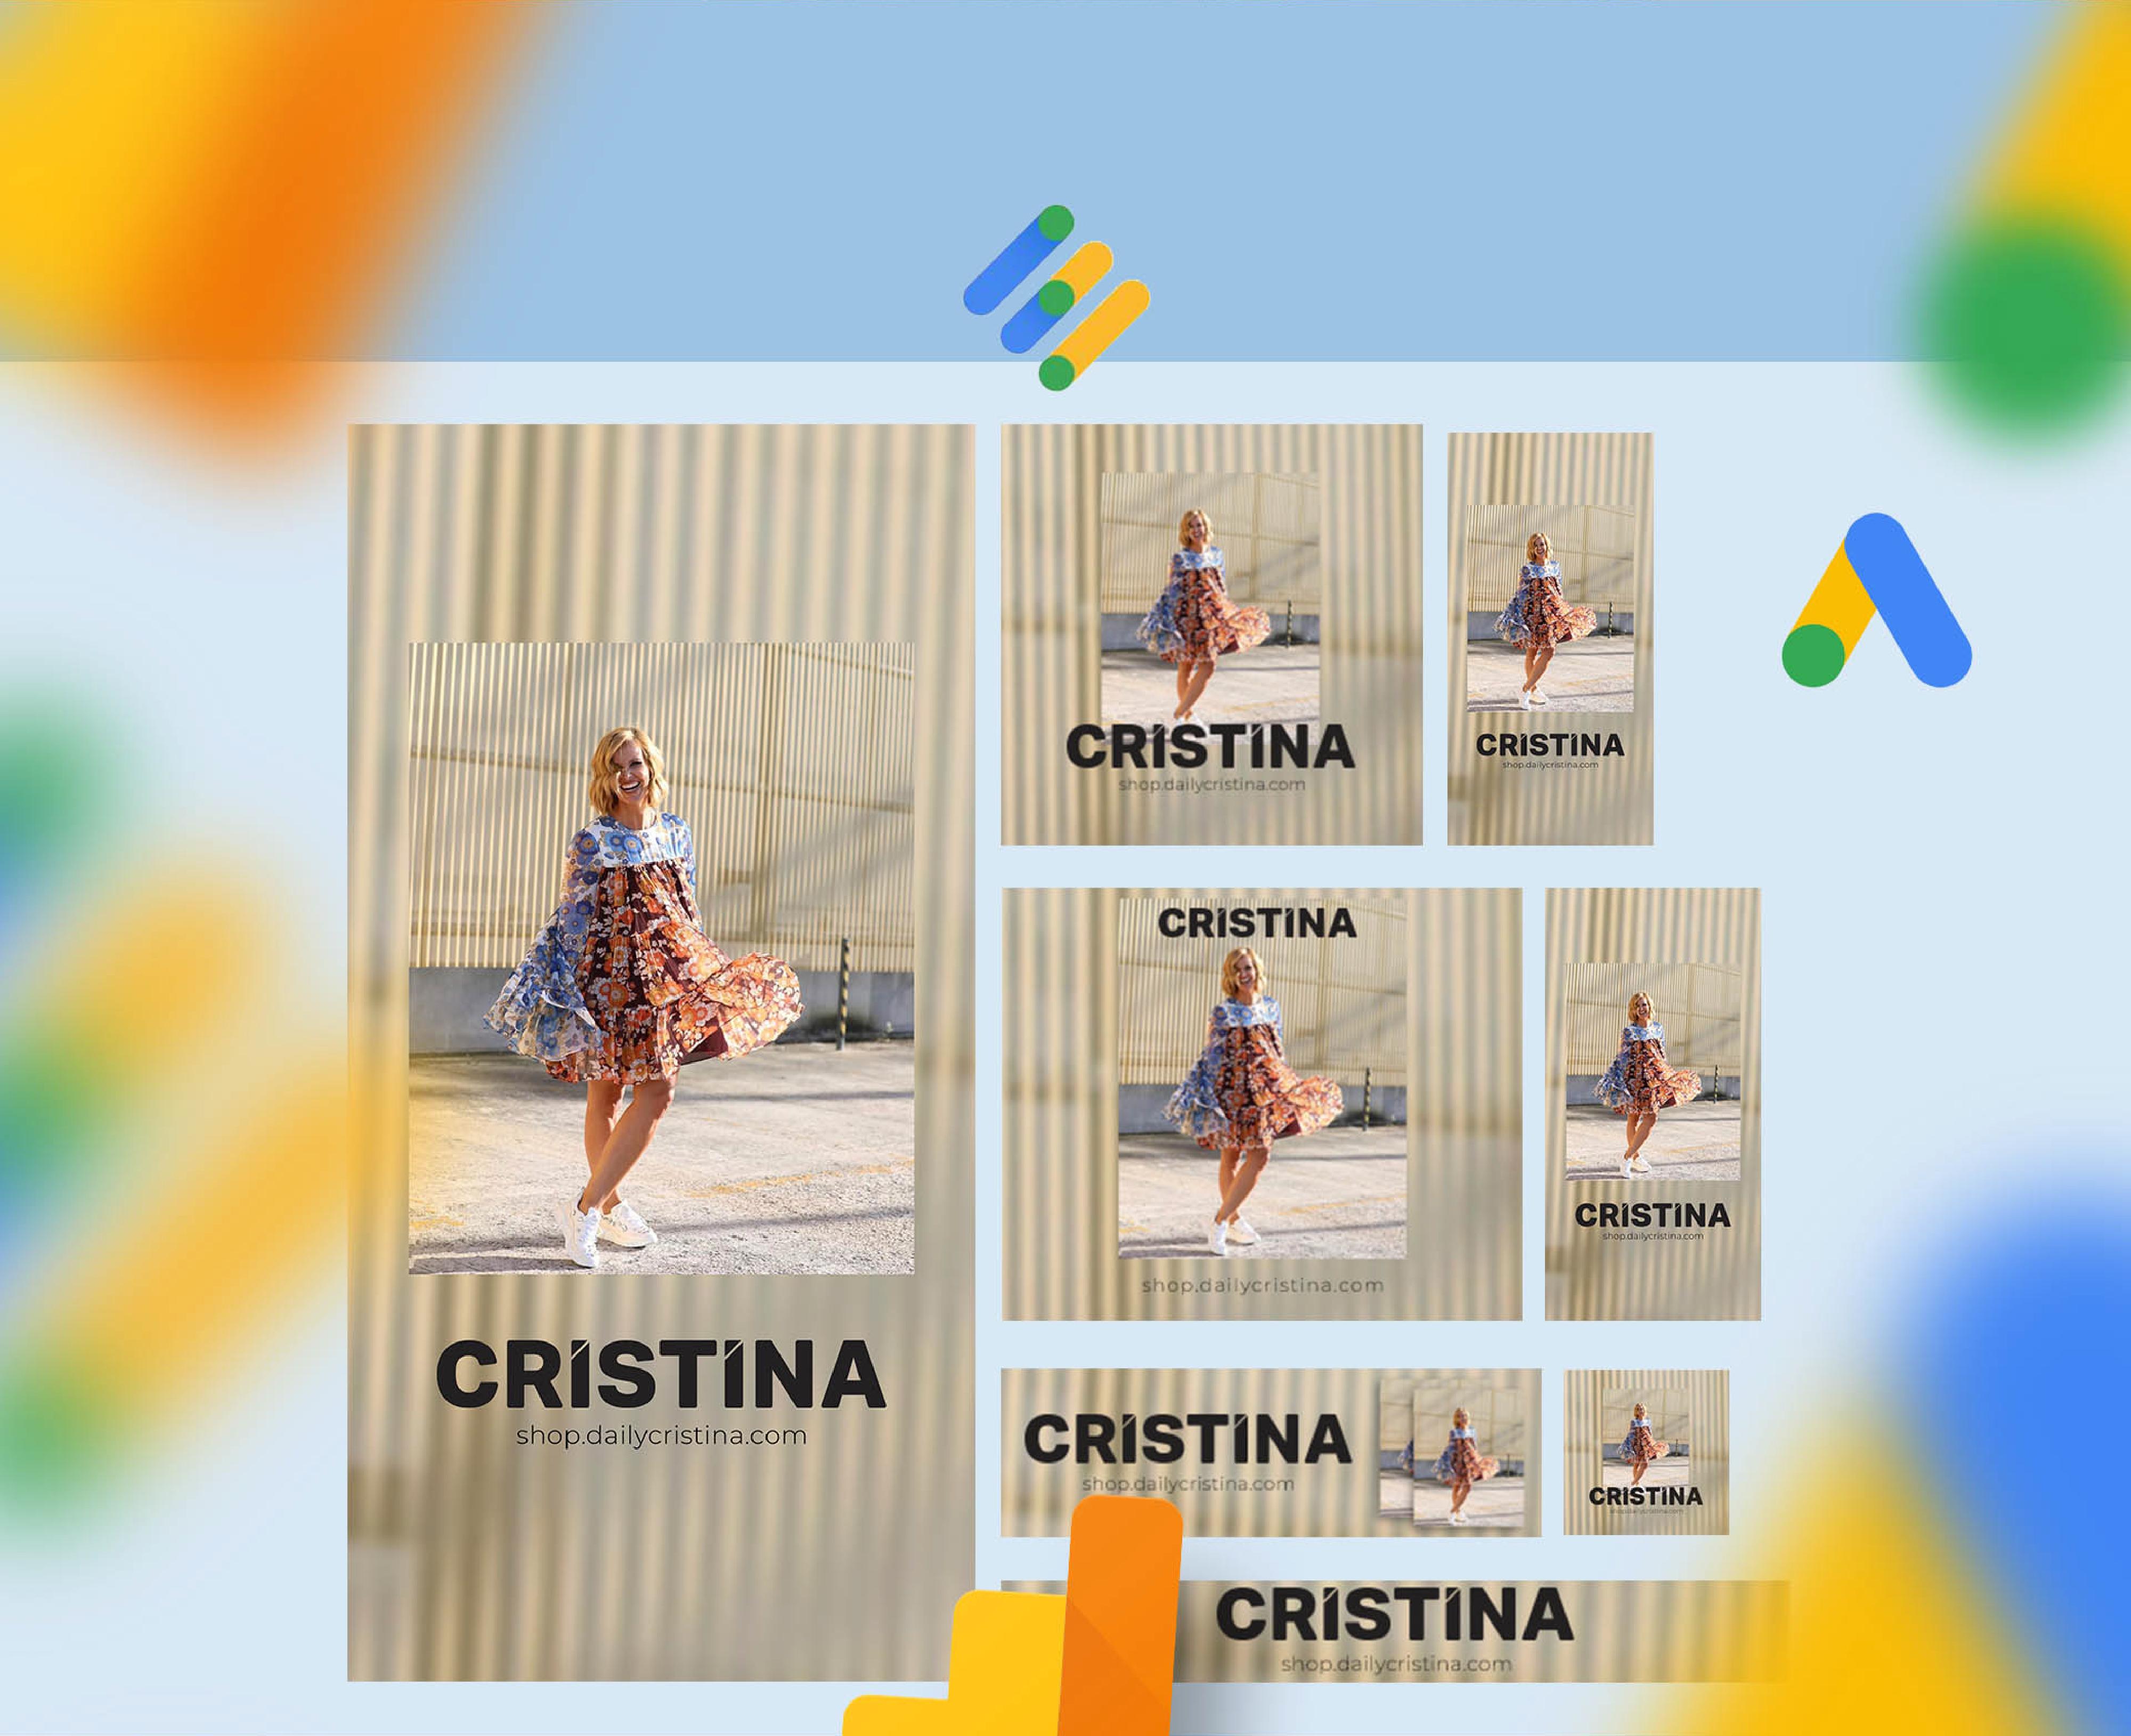 Cristina-Ferreira-08